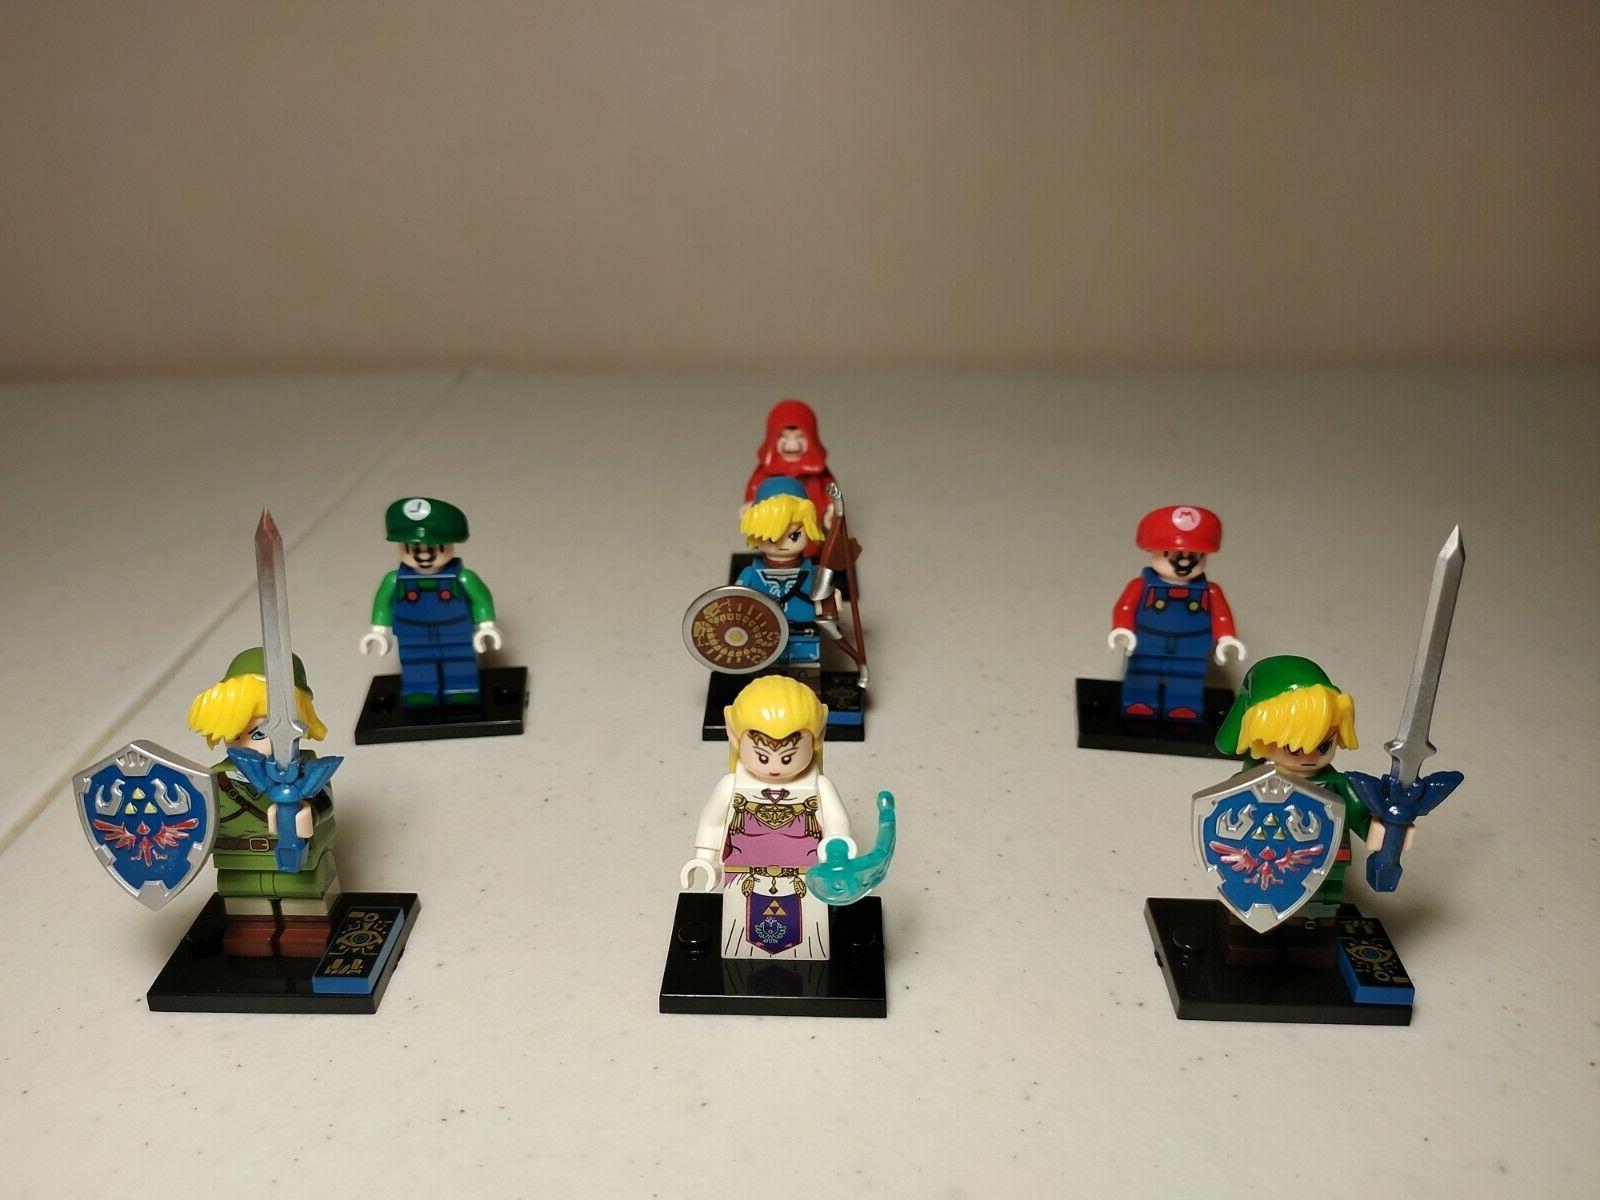 Star Wars Potter Avengers Toy Marvel Minifigure